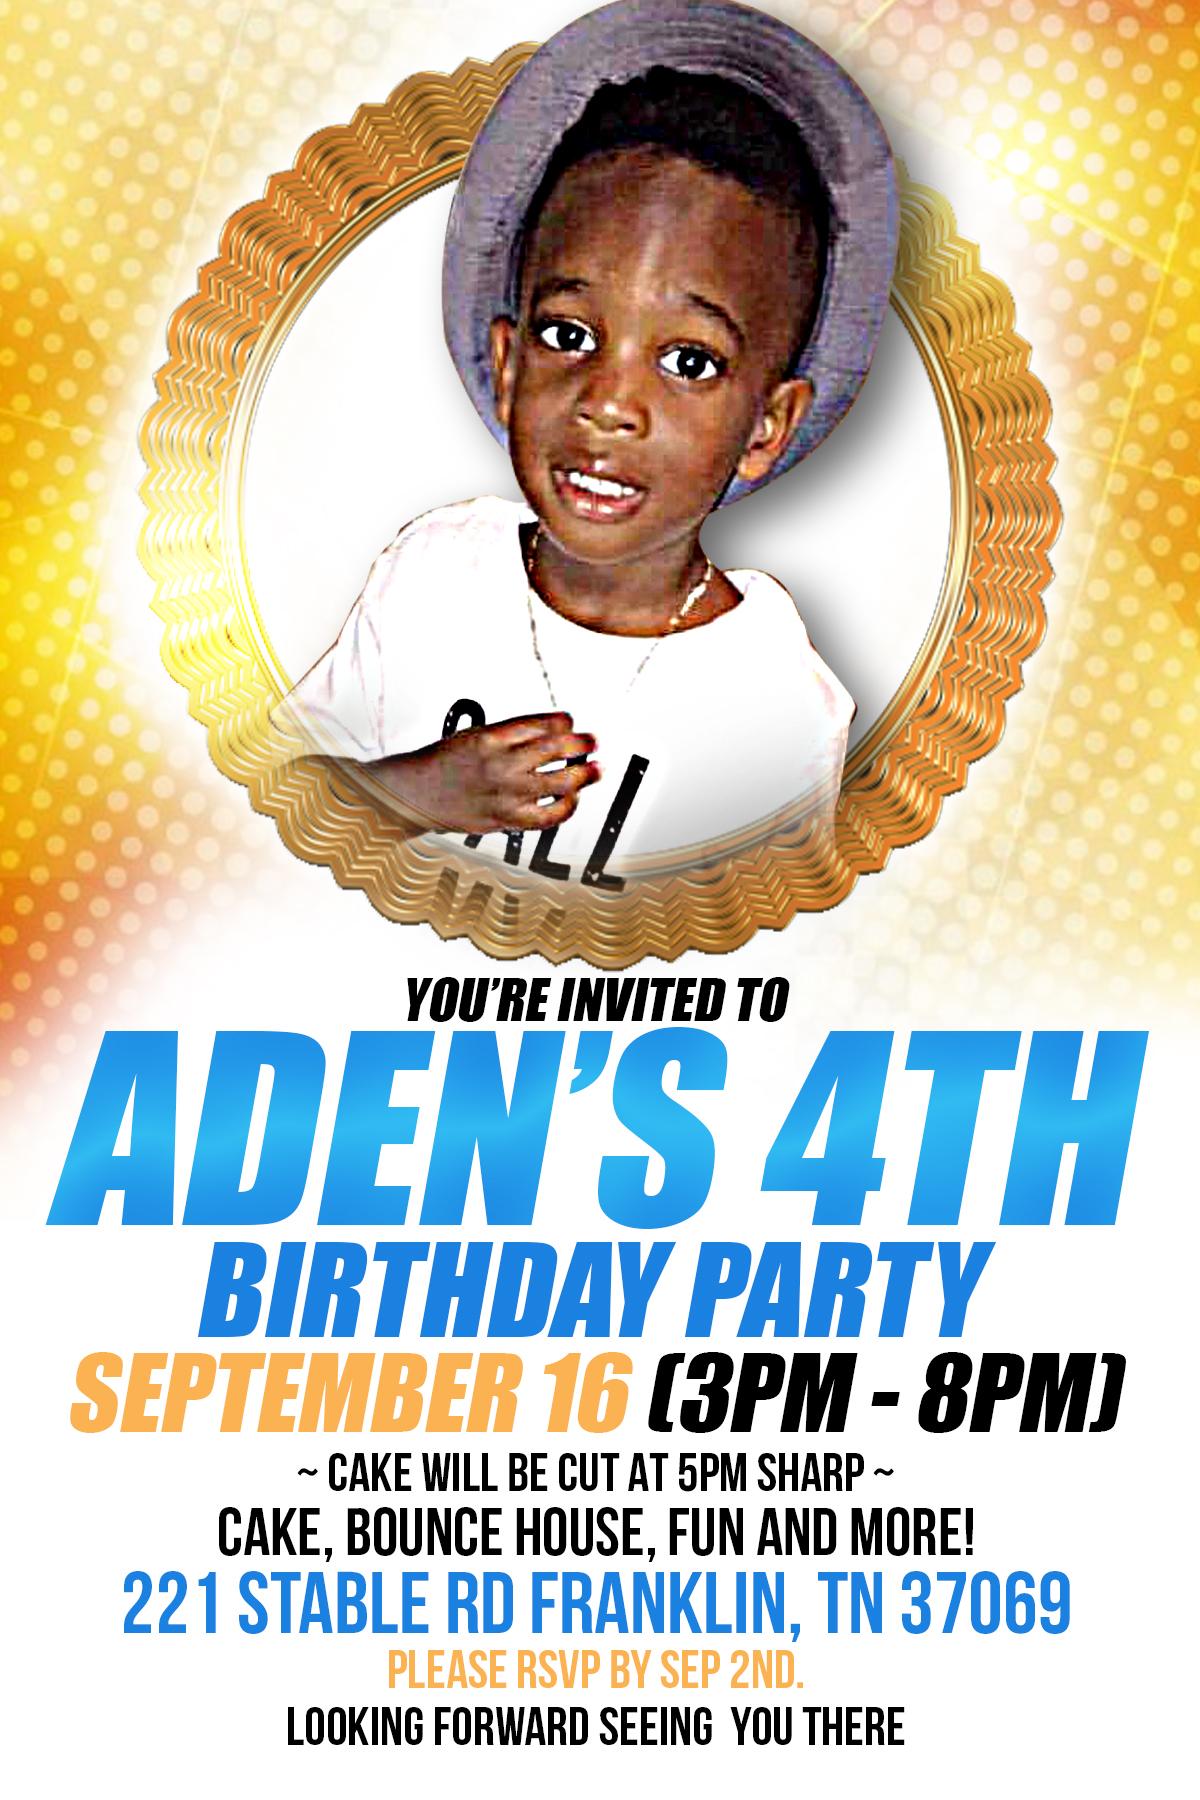 Copy of Aden's 4th Birthday Party flyer